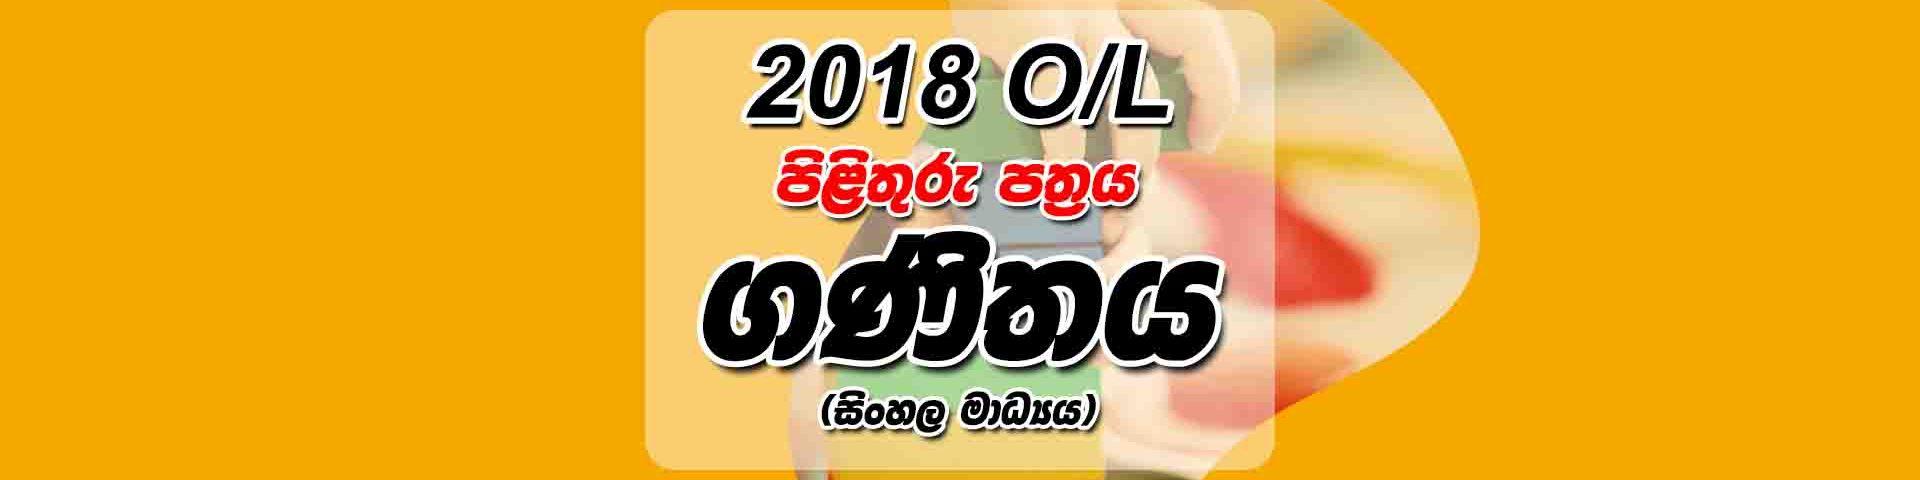 2018 O/L Maths Marking Scheme Sinhala Medium